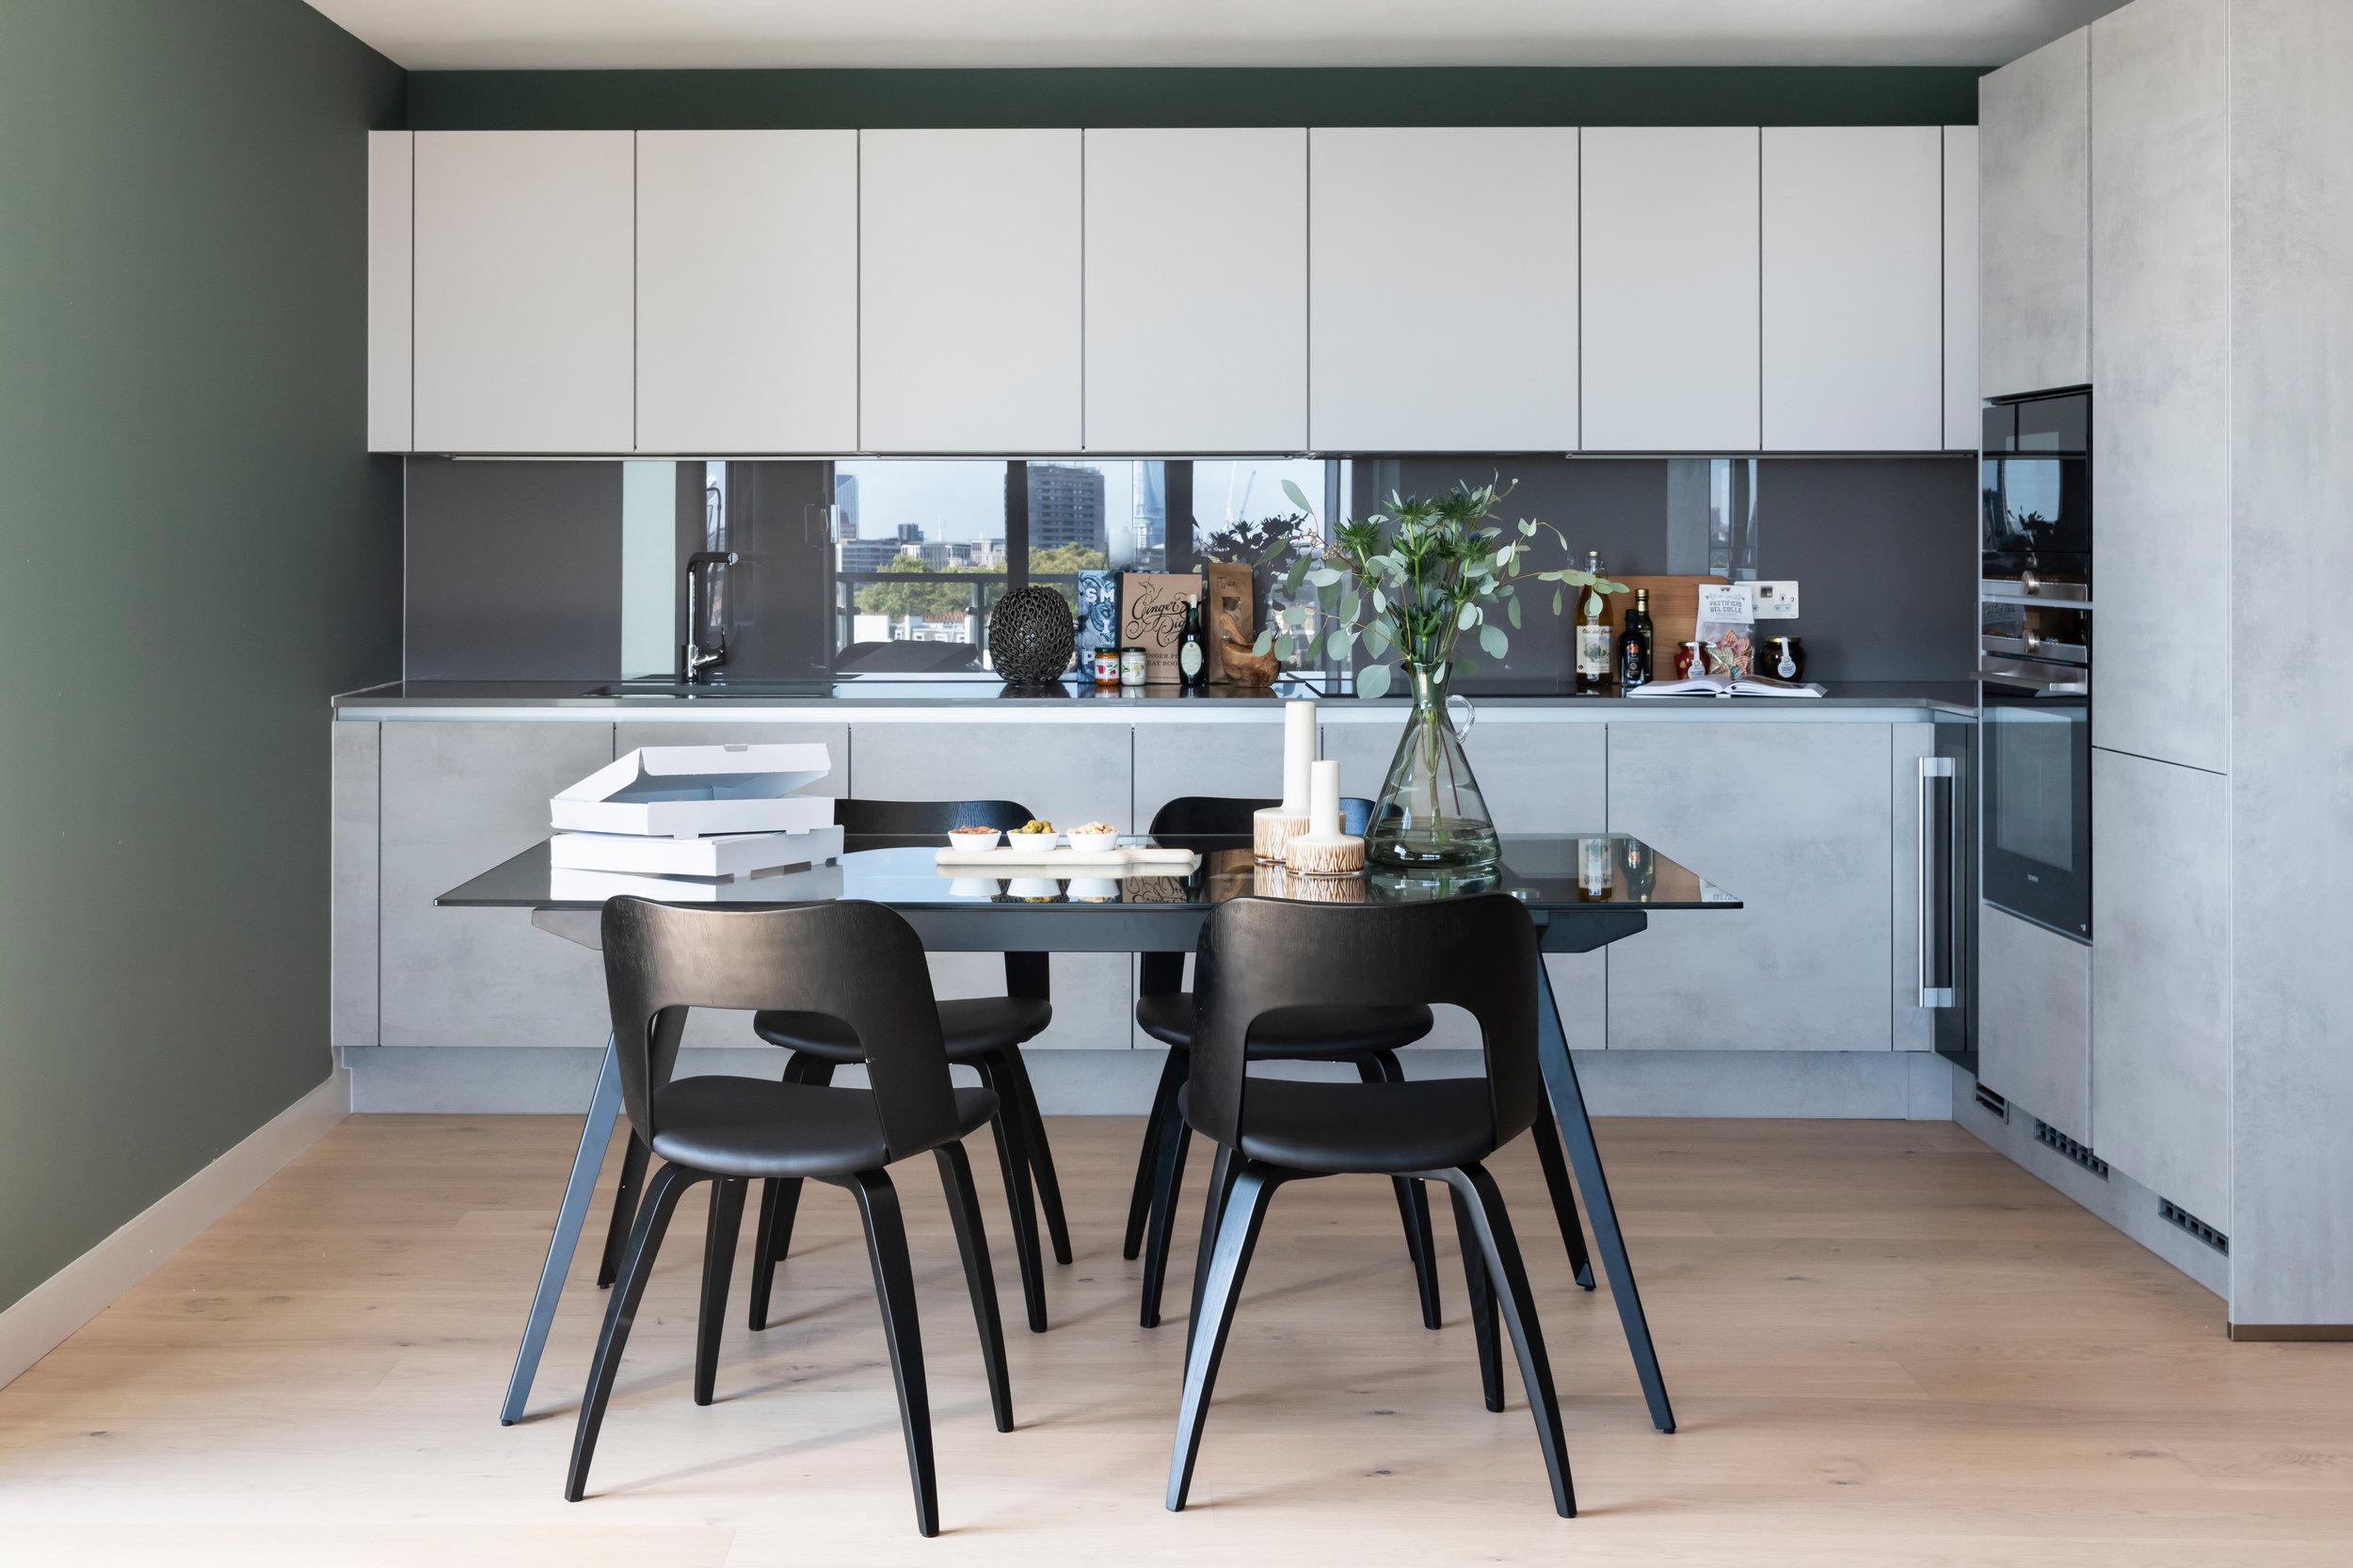 BoxNine7_Tillyer_10_Dining_Room_Kitchen.jpg